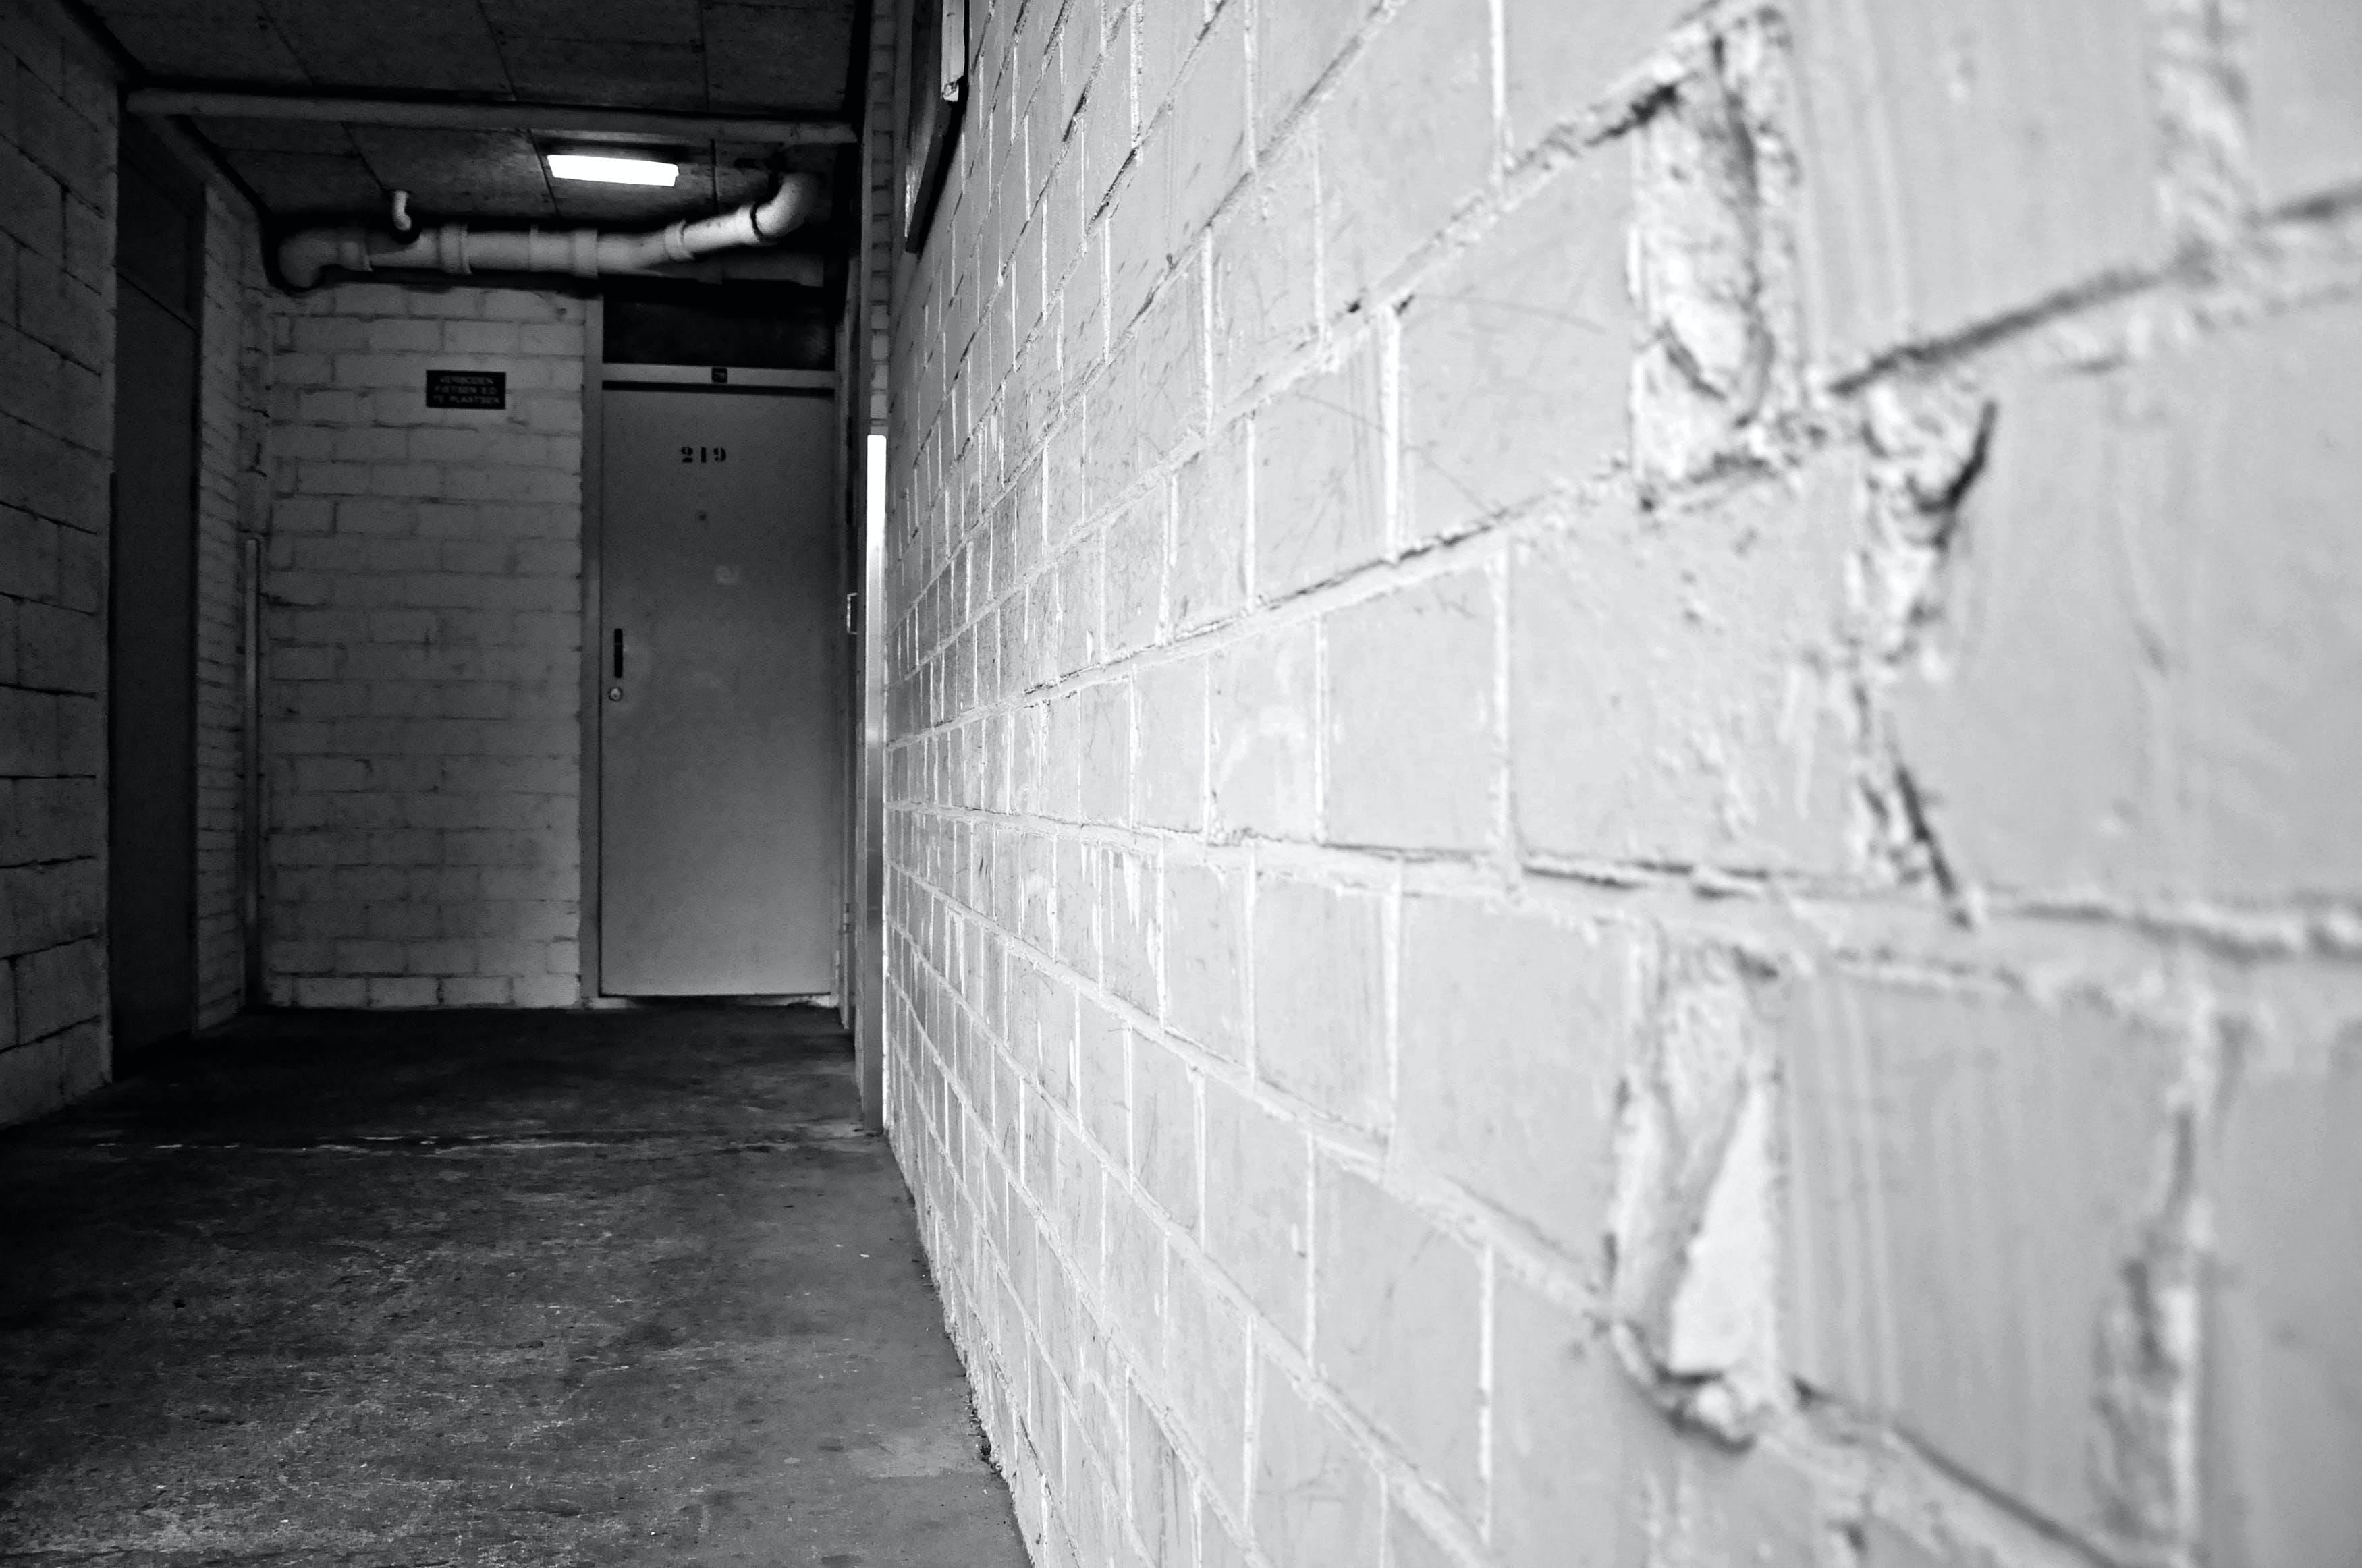 Free stock photo of dark, wall, storage, brick wall